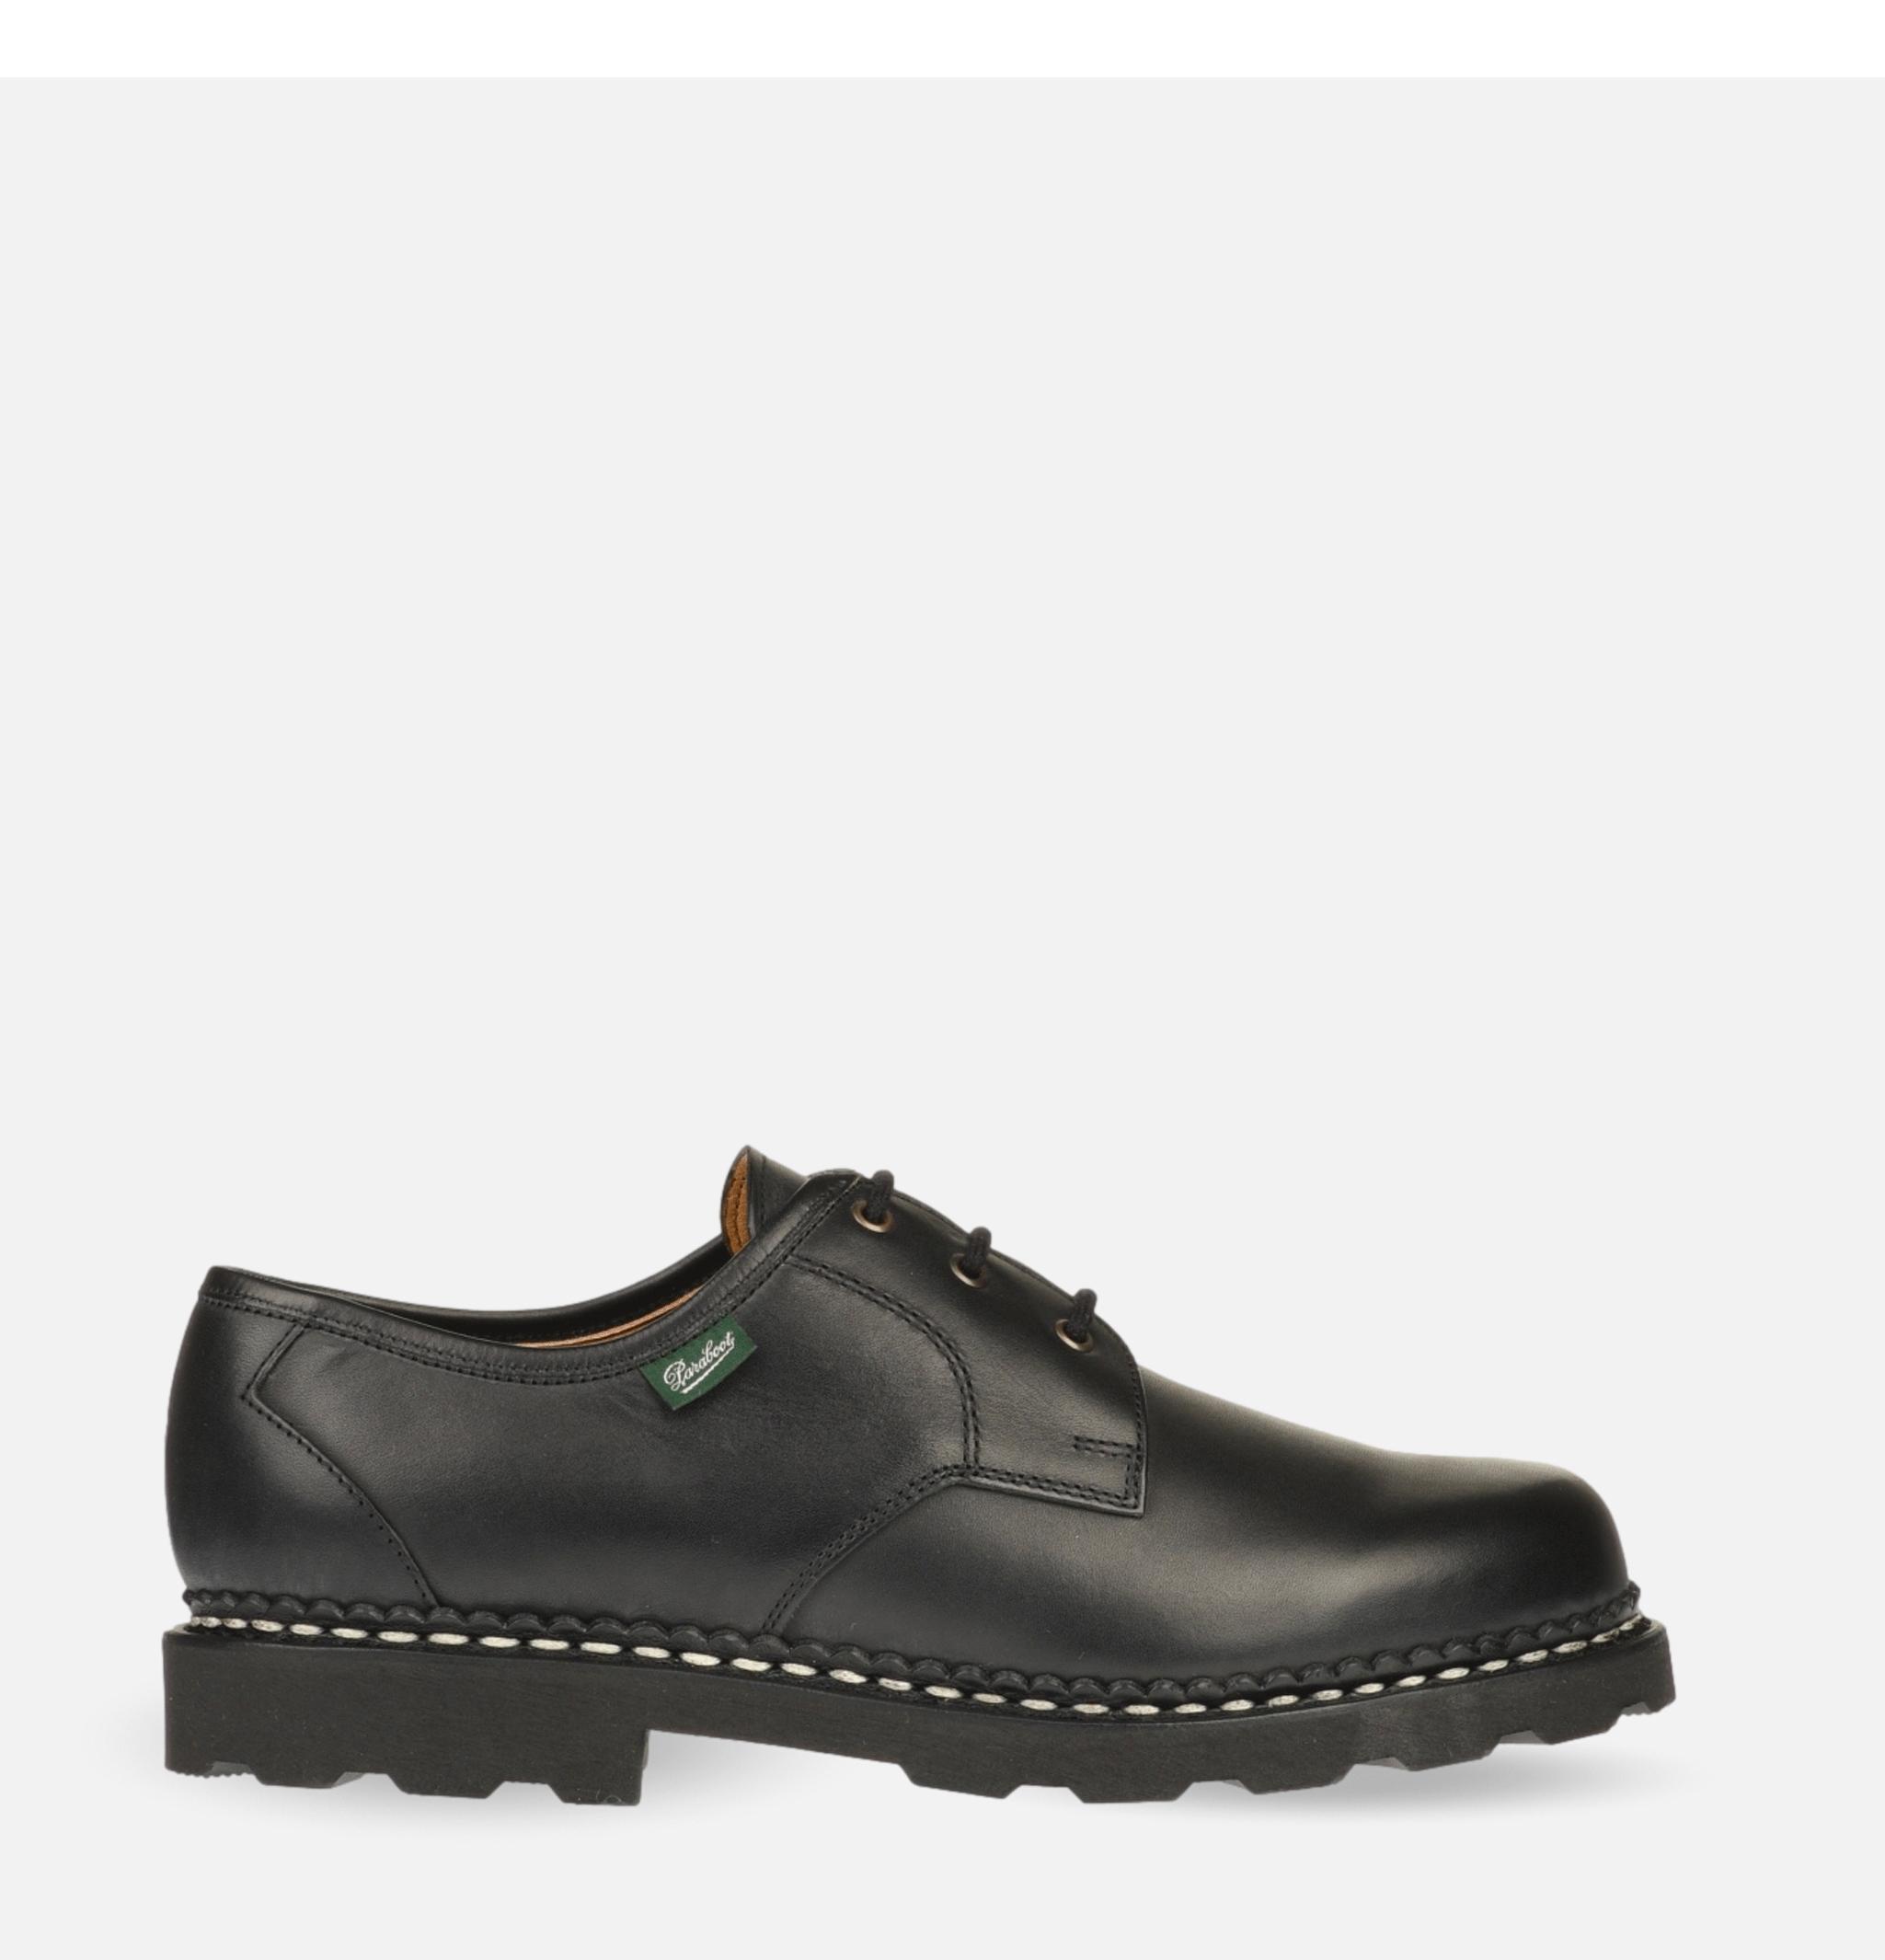 Chaussures Castel Noir